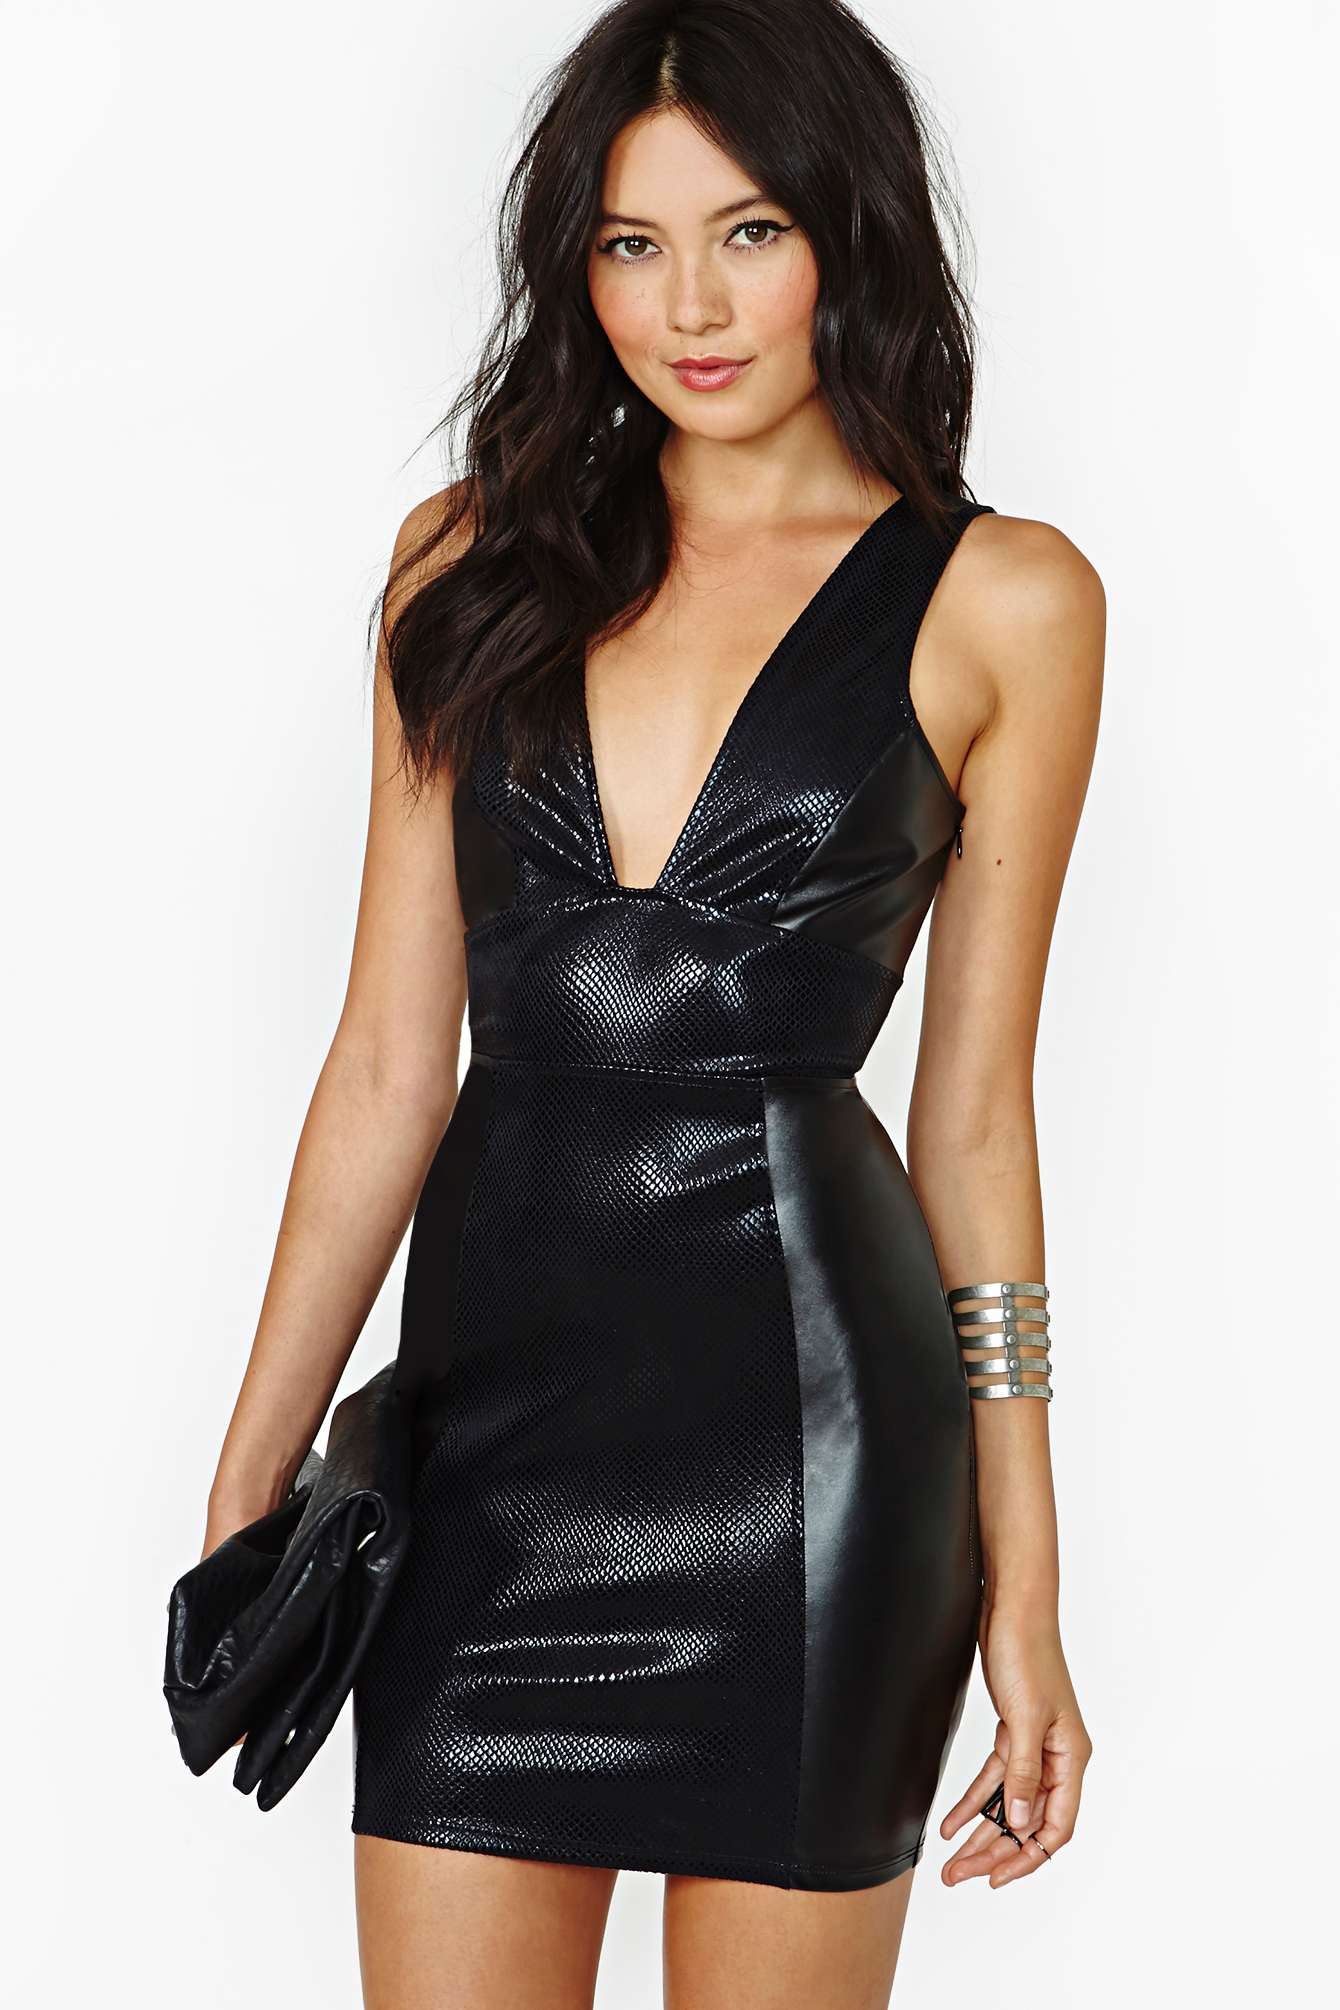 Womenin Leather Attire Vedios 81